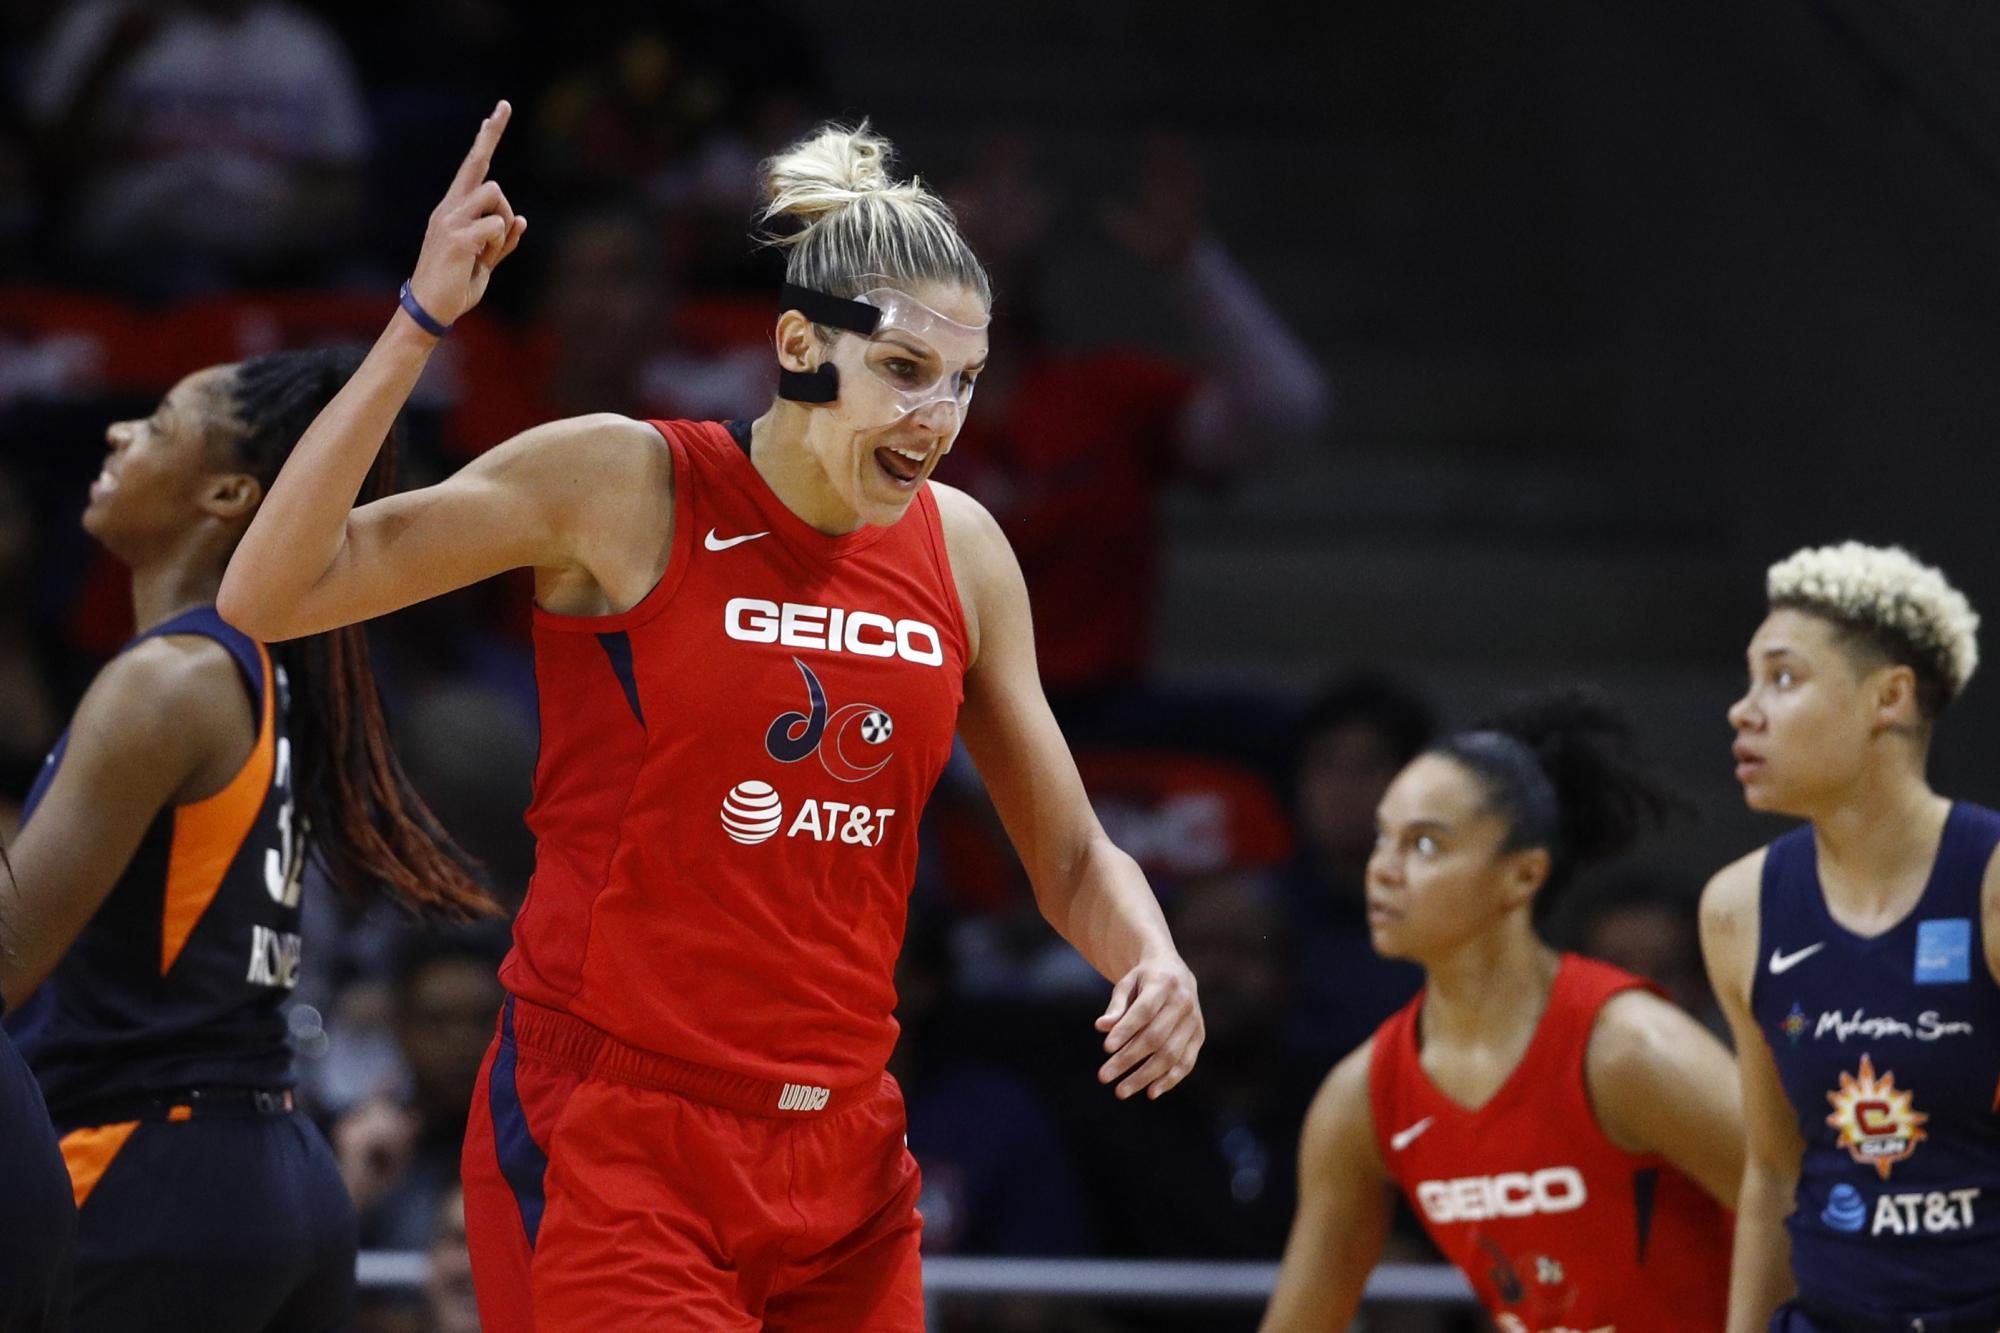 Washington Mystics lose to Connecticut Sun tying WNBA Finals 1-1